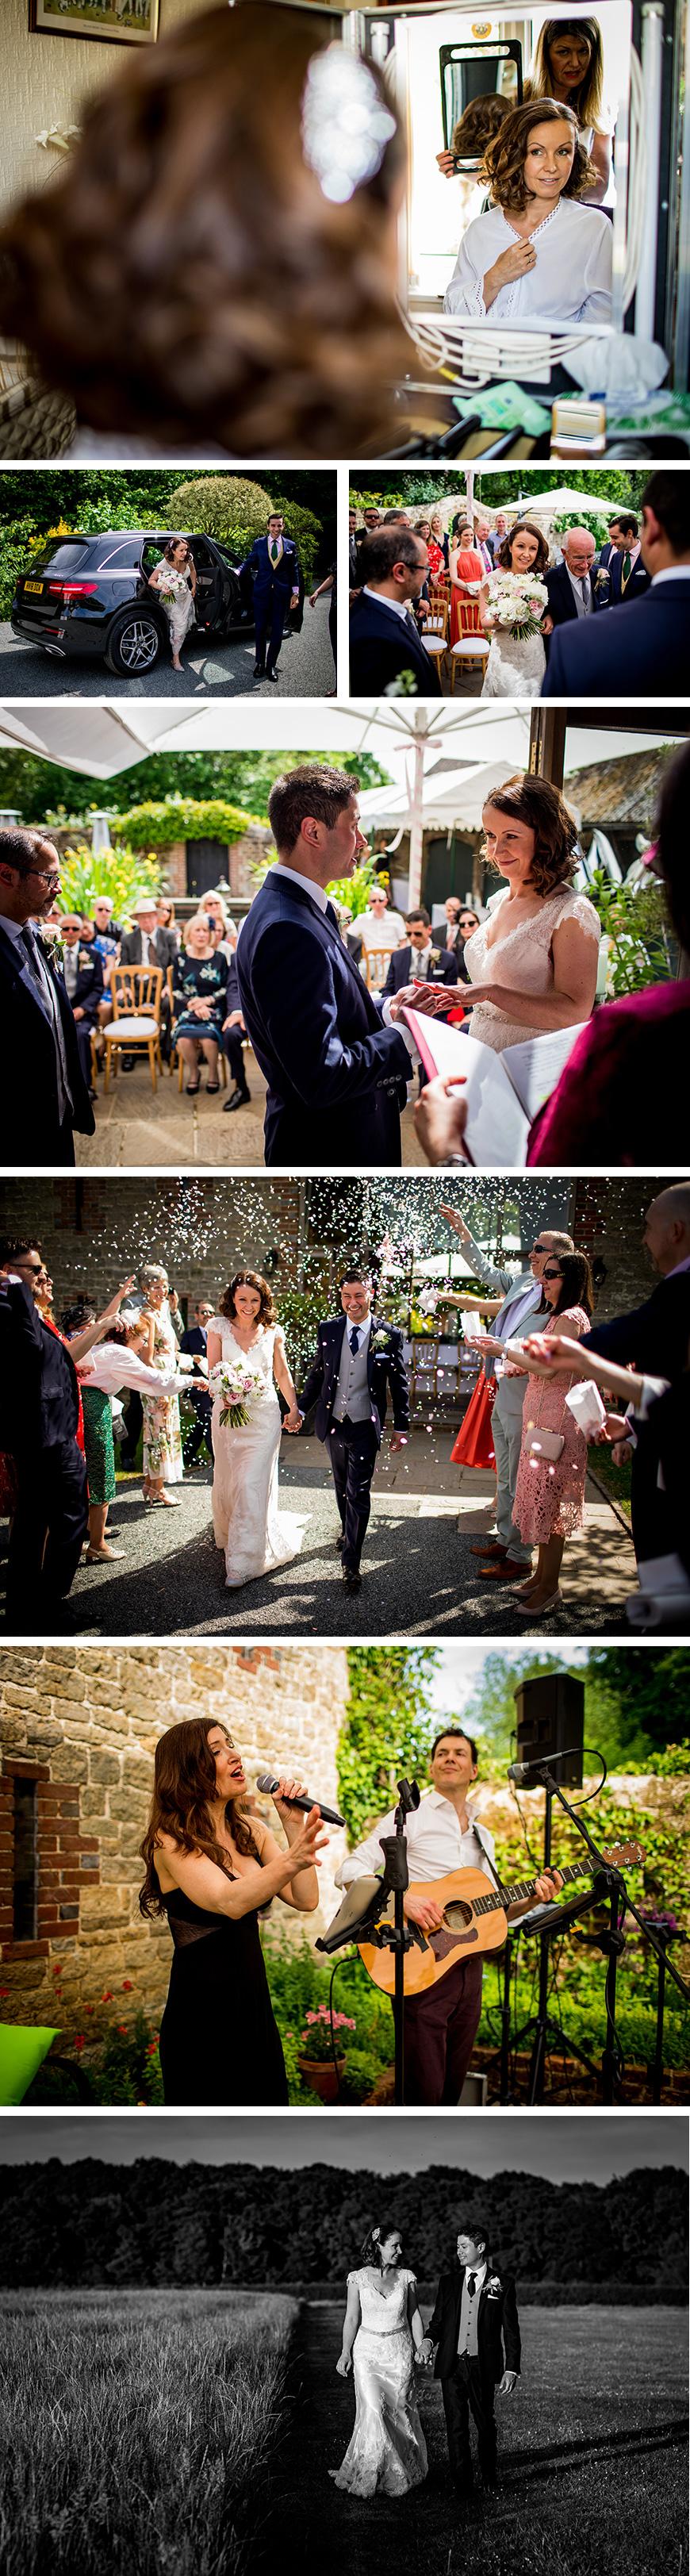 Real Wedding - Nicky and Alex's Intimate Summer Wedding At Bartholomew Barn   CHWV